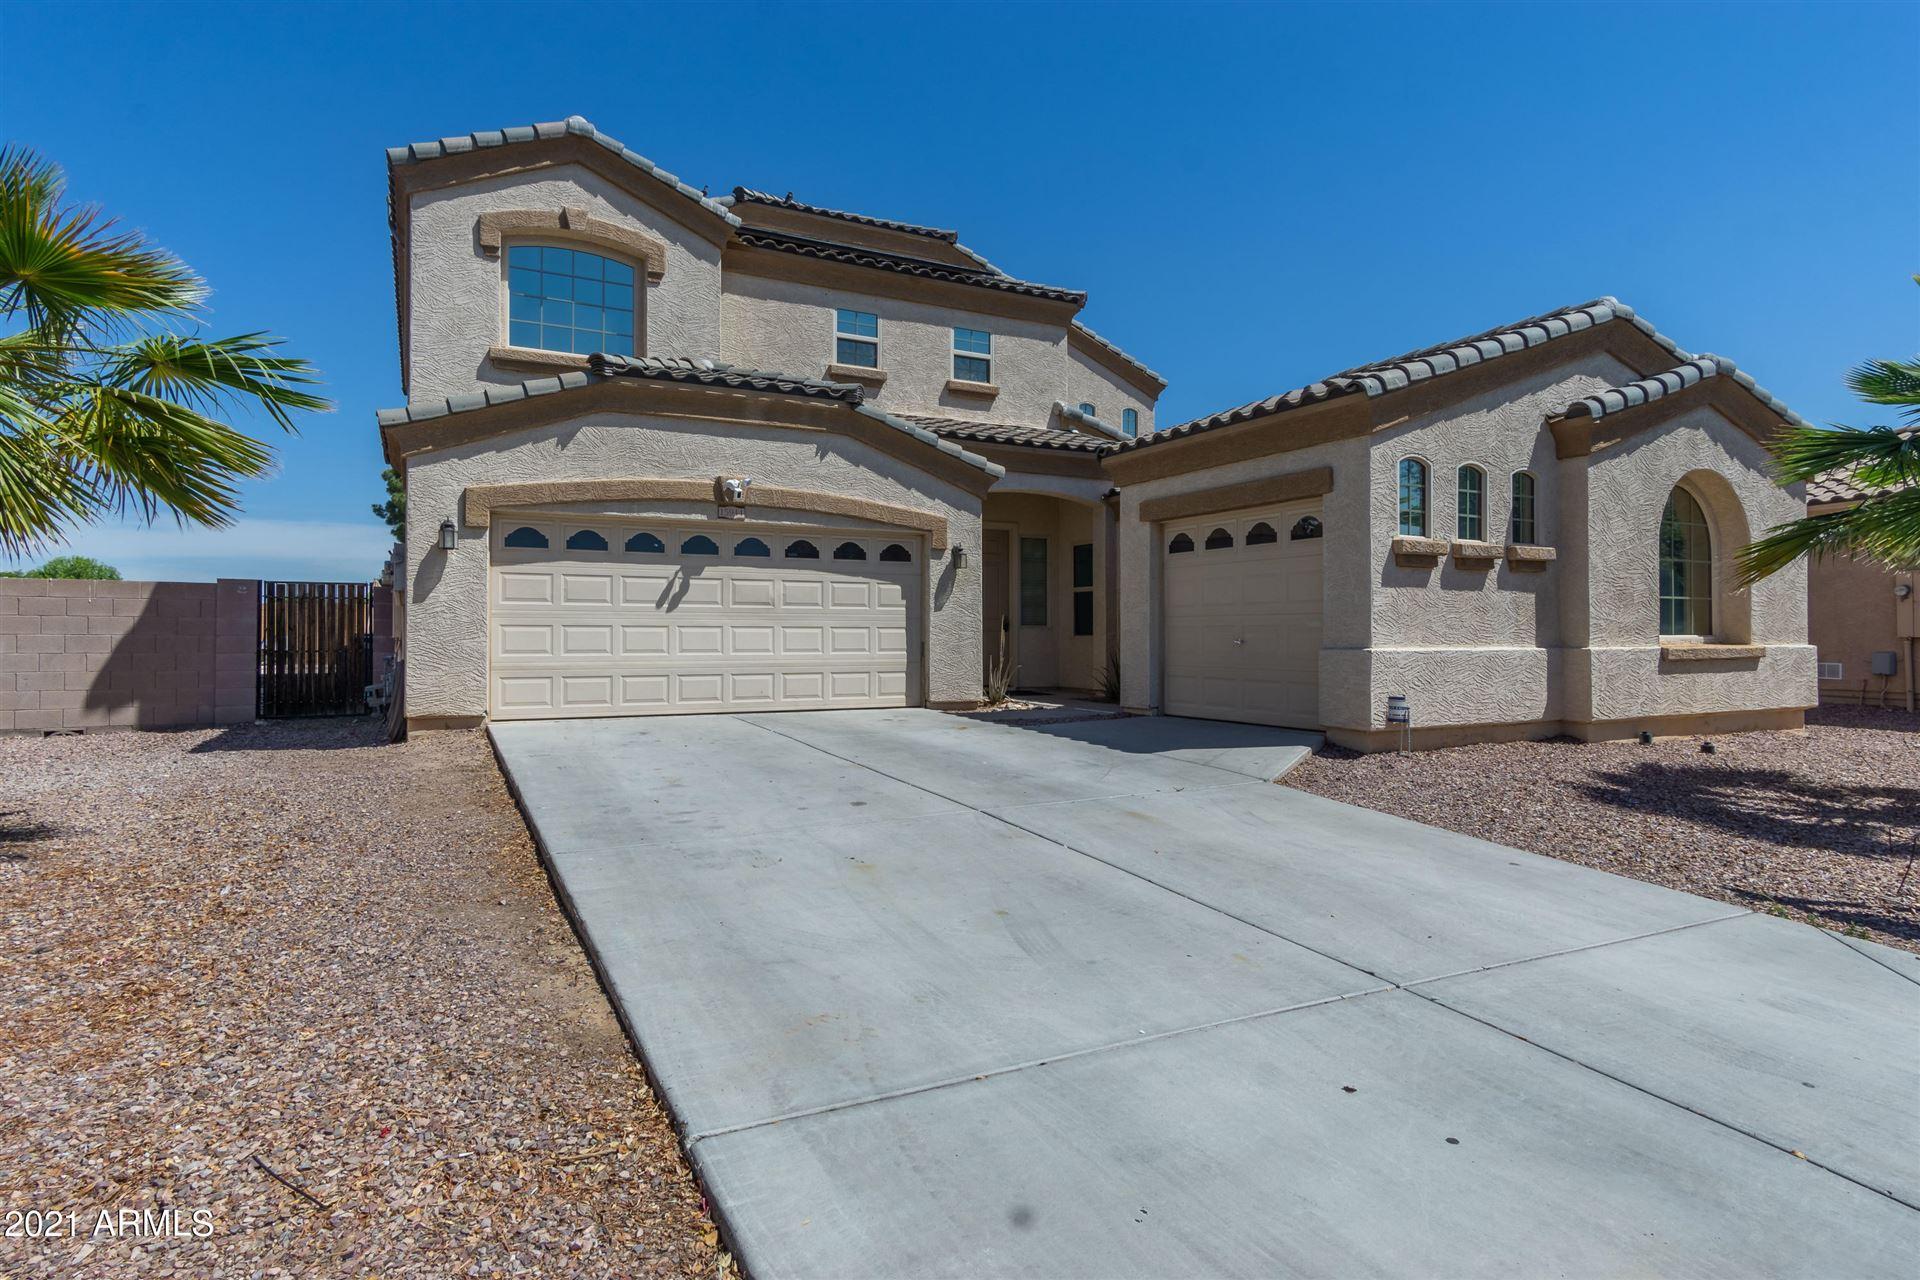 Photo of 15944 W FILLMORE Street, Goodyear, AZ 85338 (MLS # 6230388)